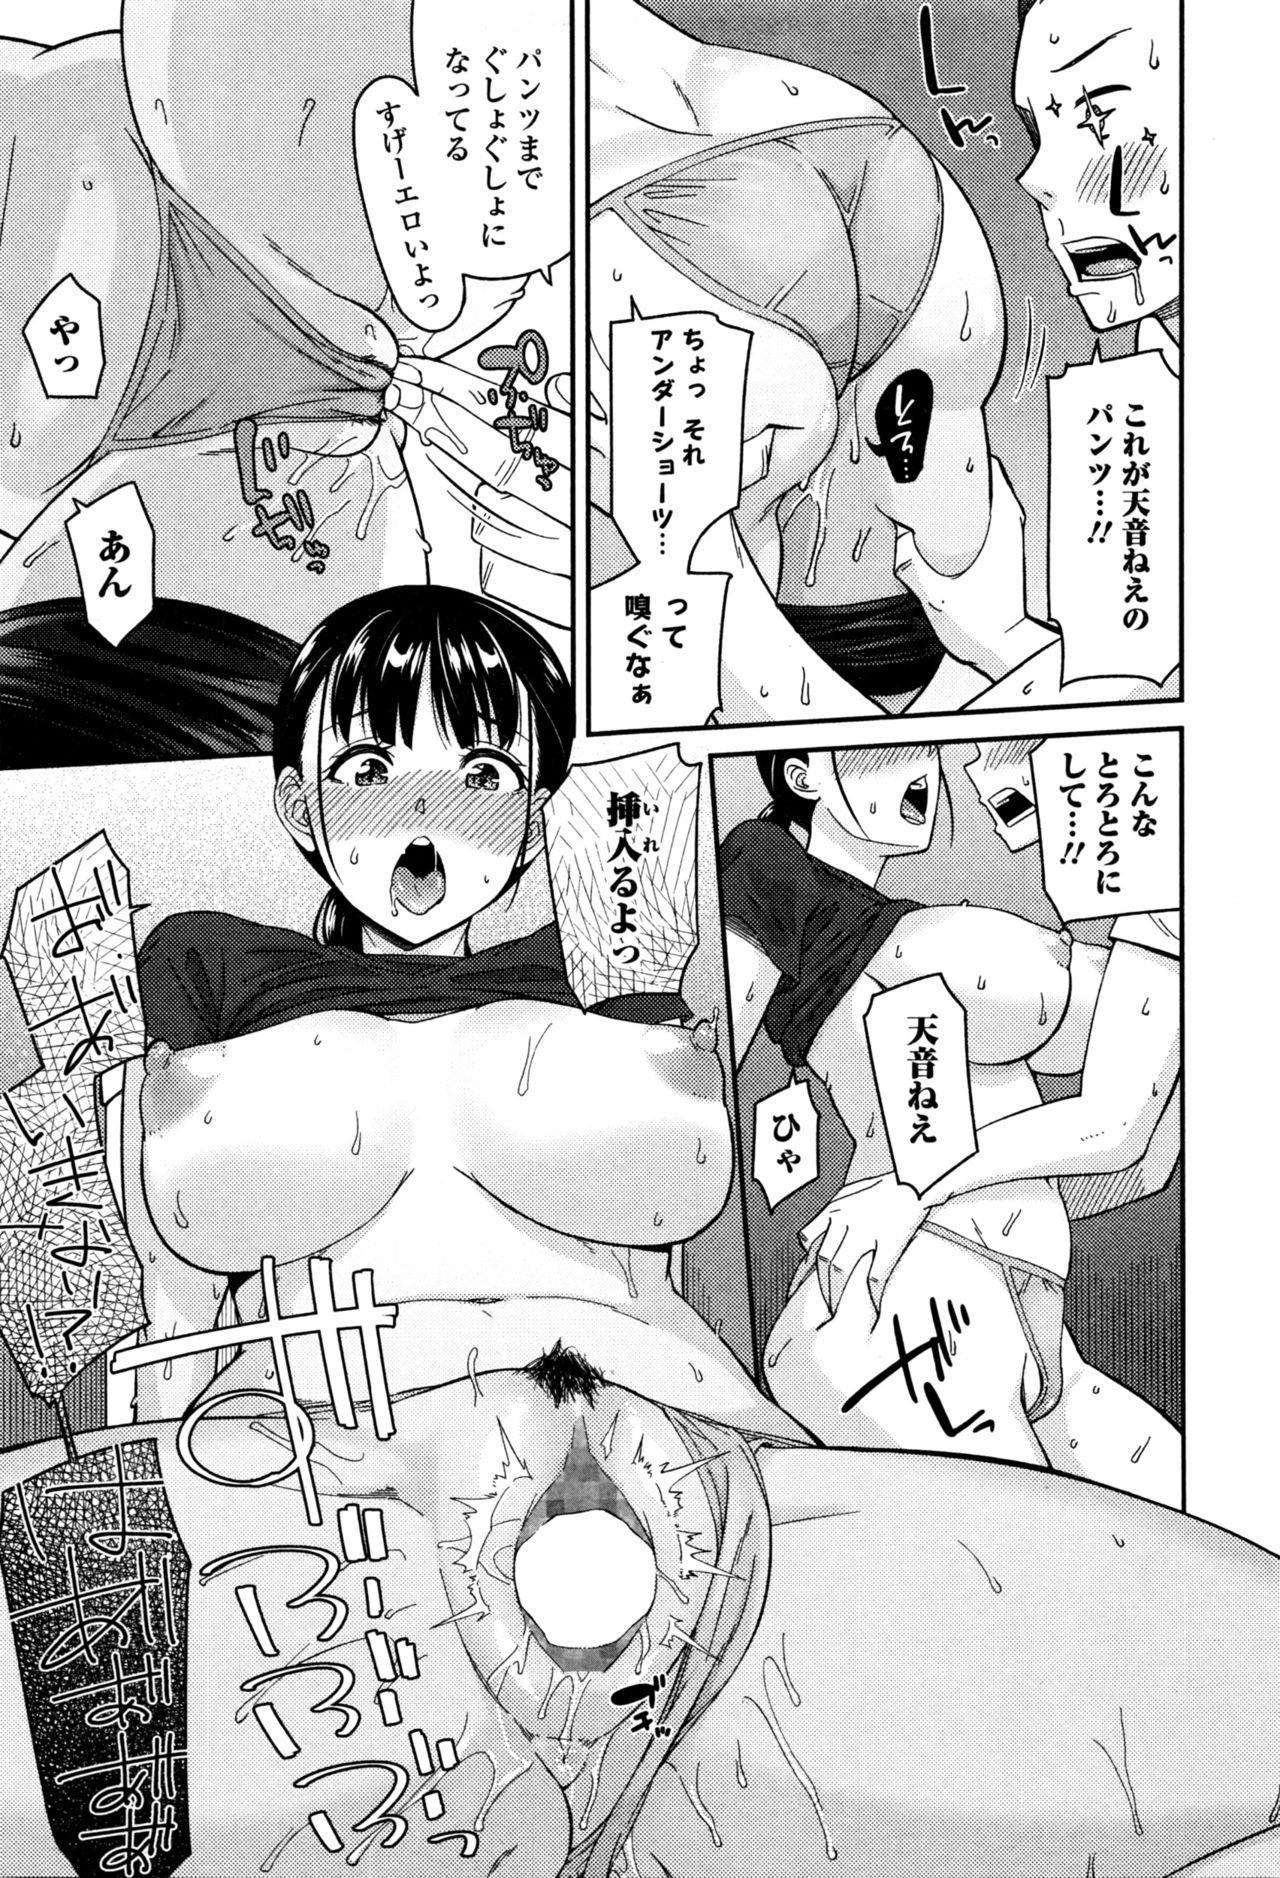 Comic JSCK Vol.4 2016-05 193